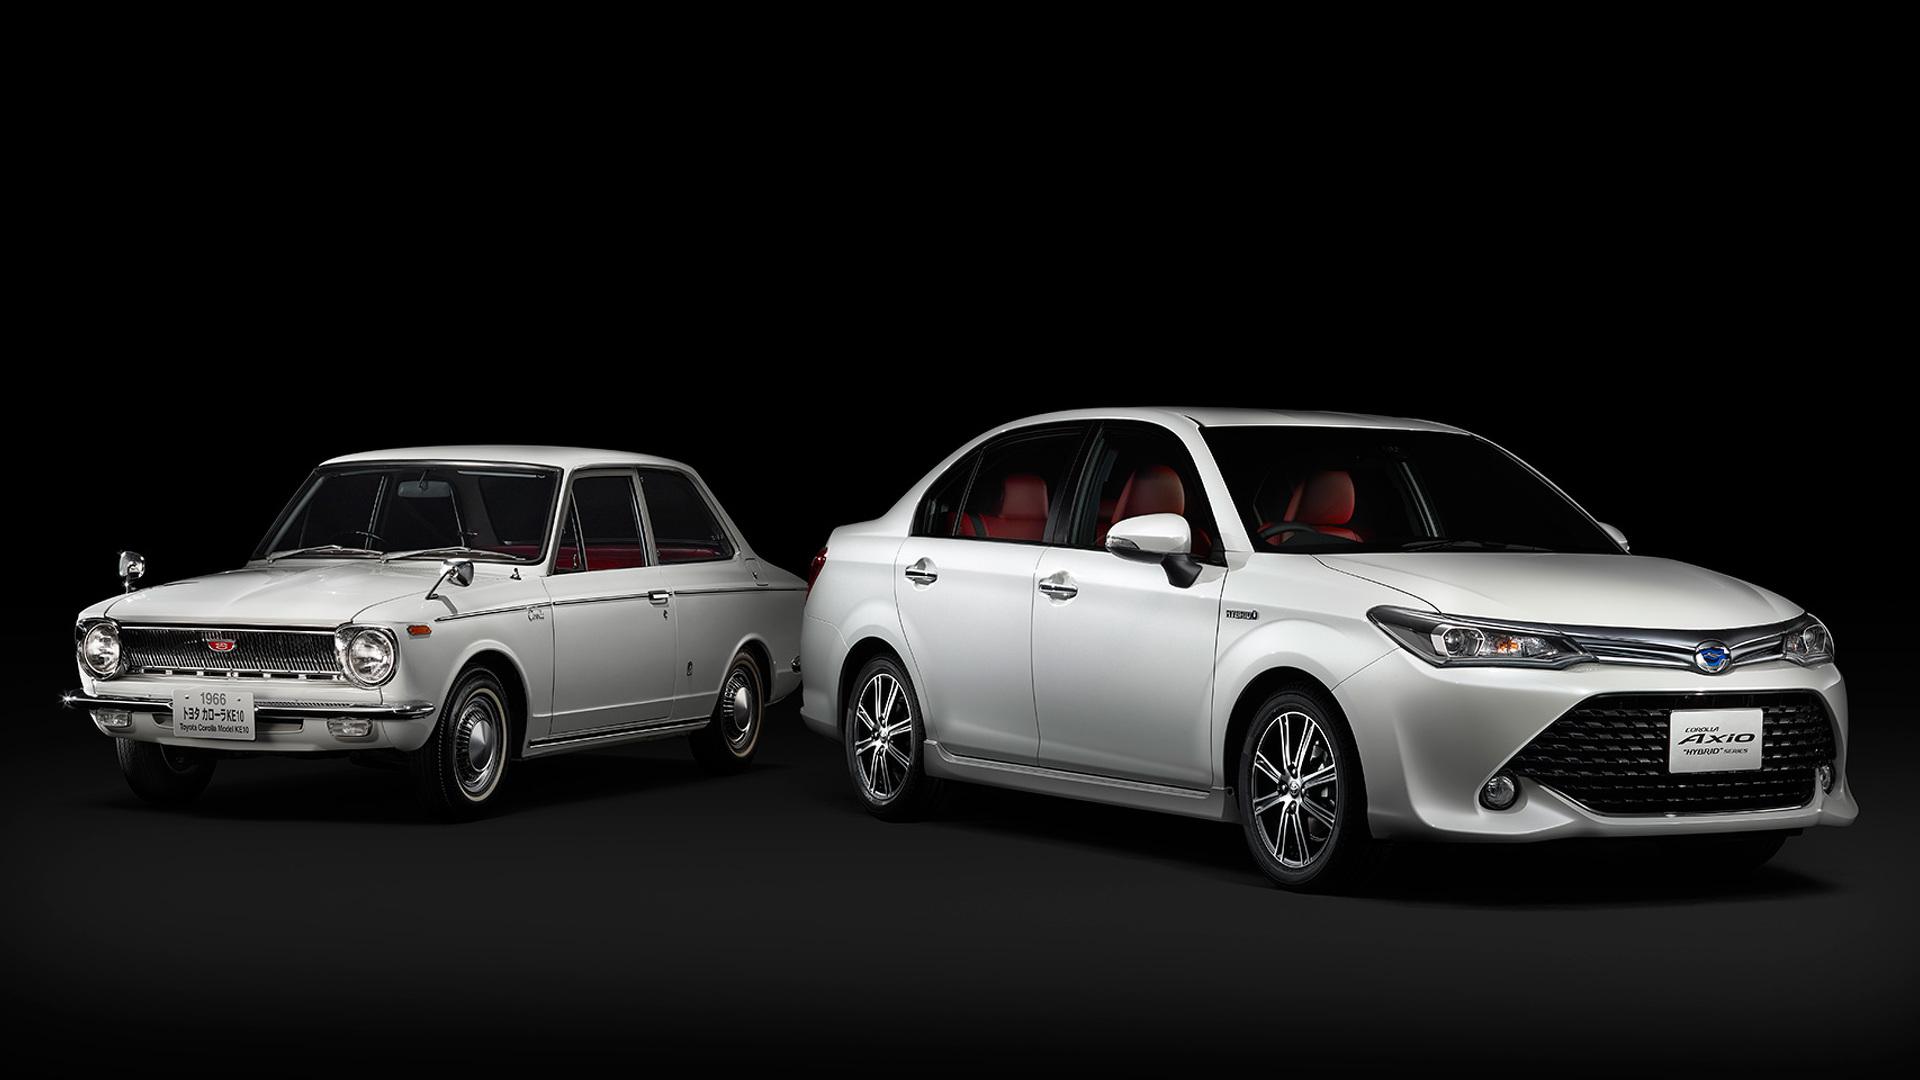 Toyota Corolla Celebrates 50th Anniversary With Axio 50 Limited Edition